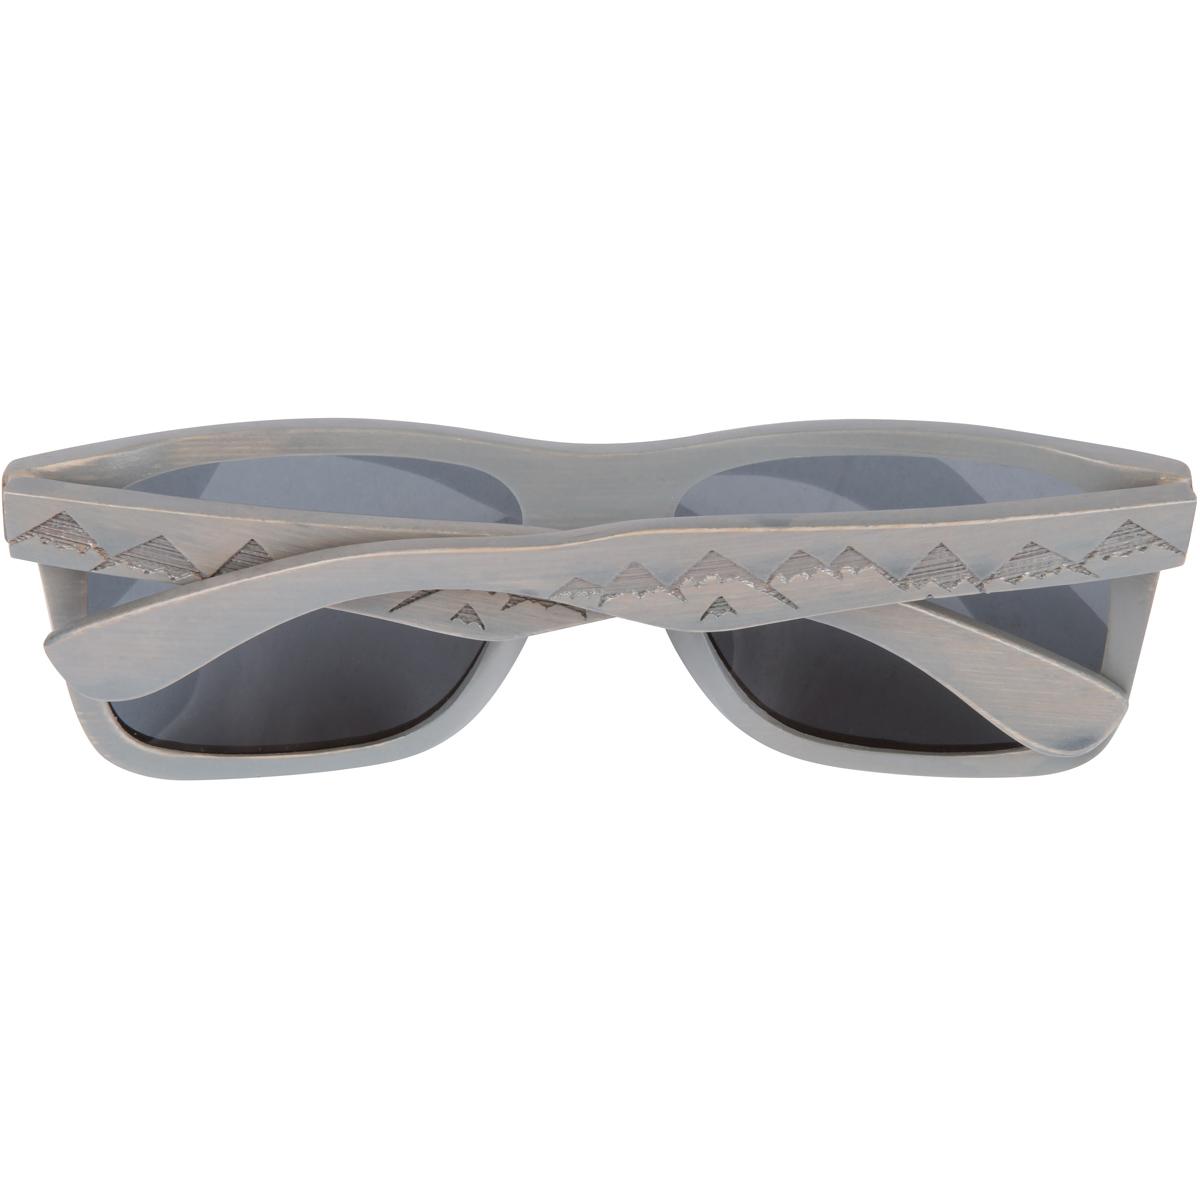 Bamboo Sunglasses  everest bamboo frame shiner sunglasses